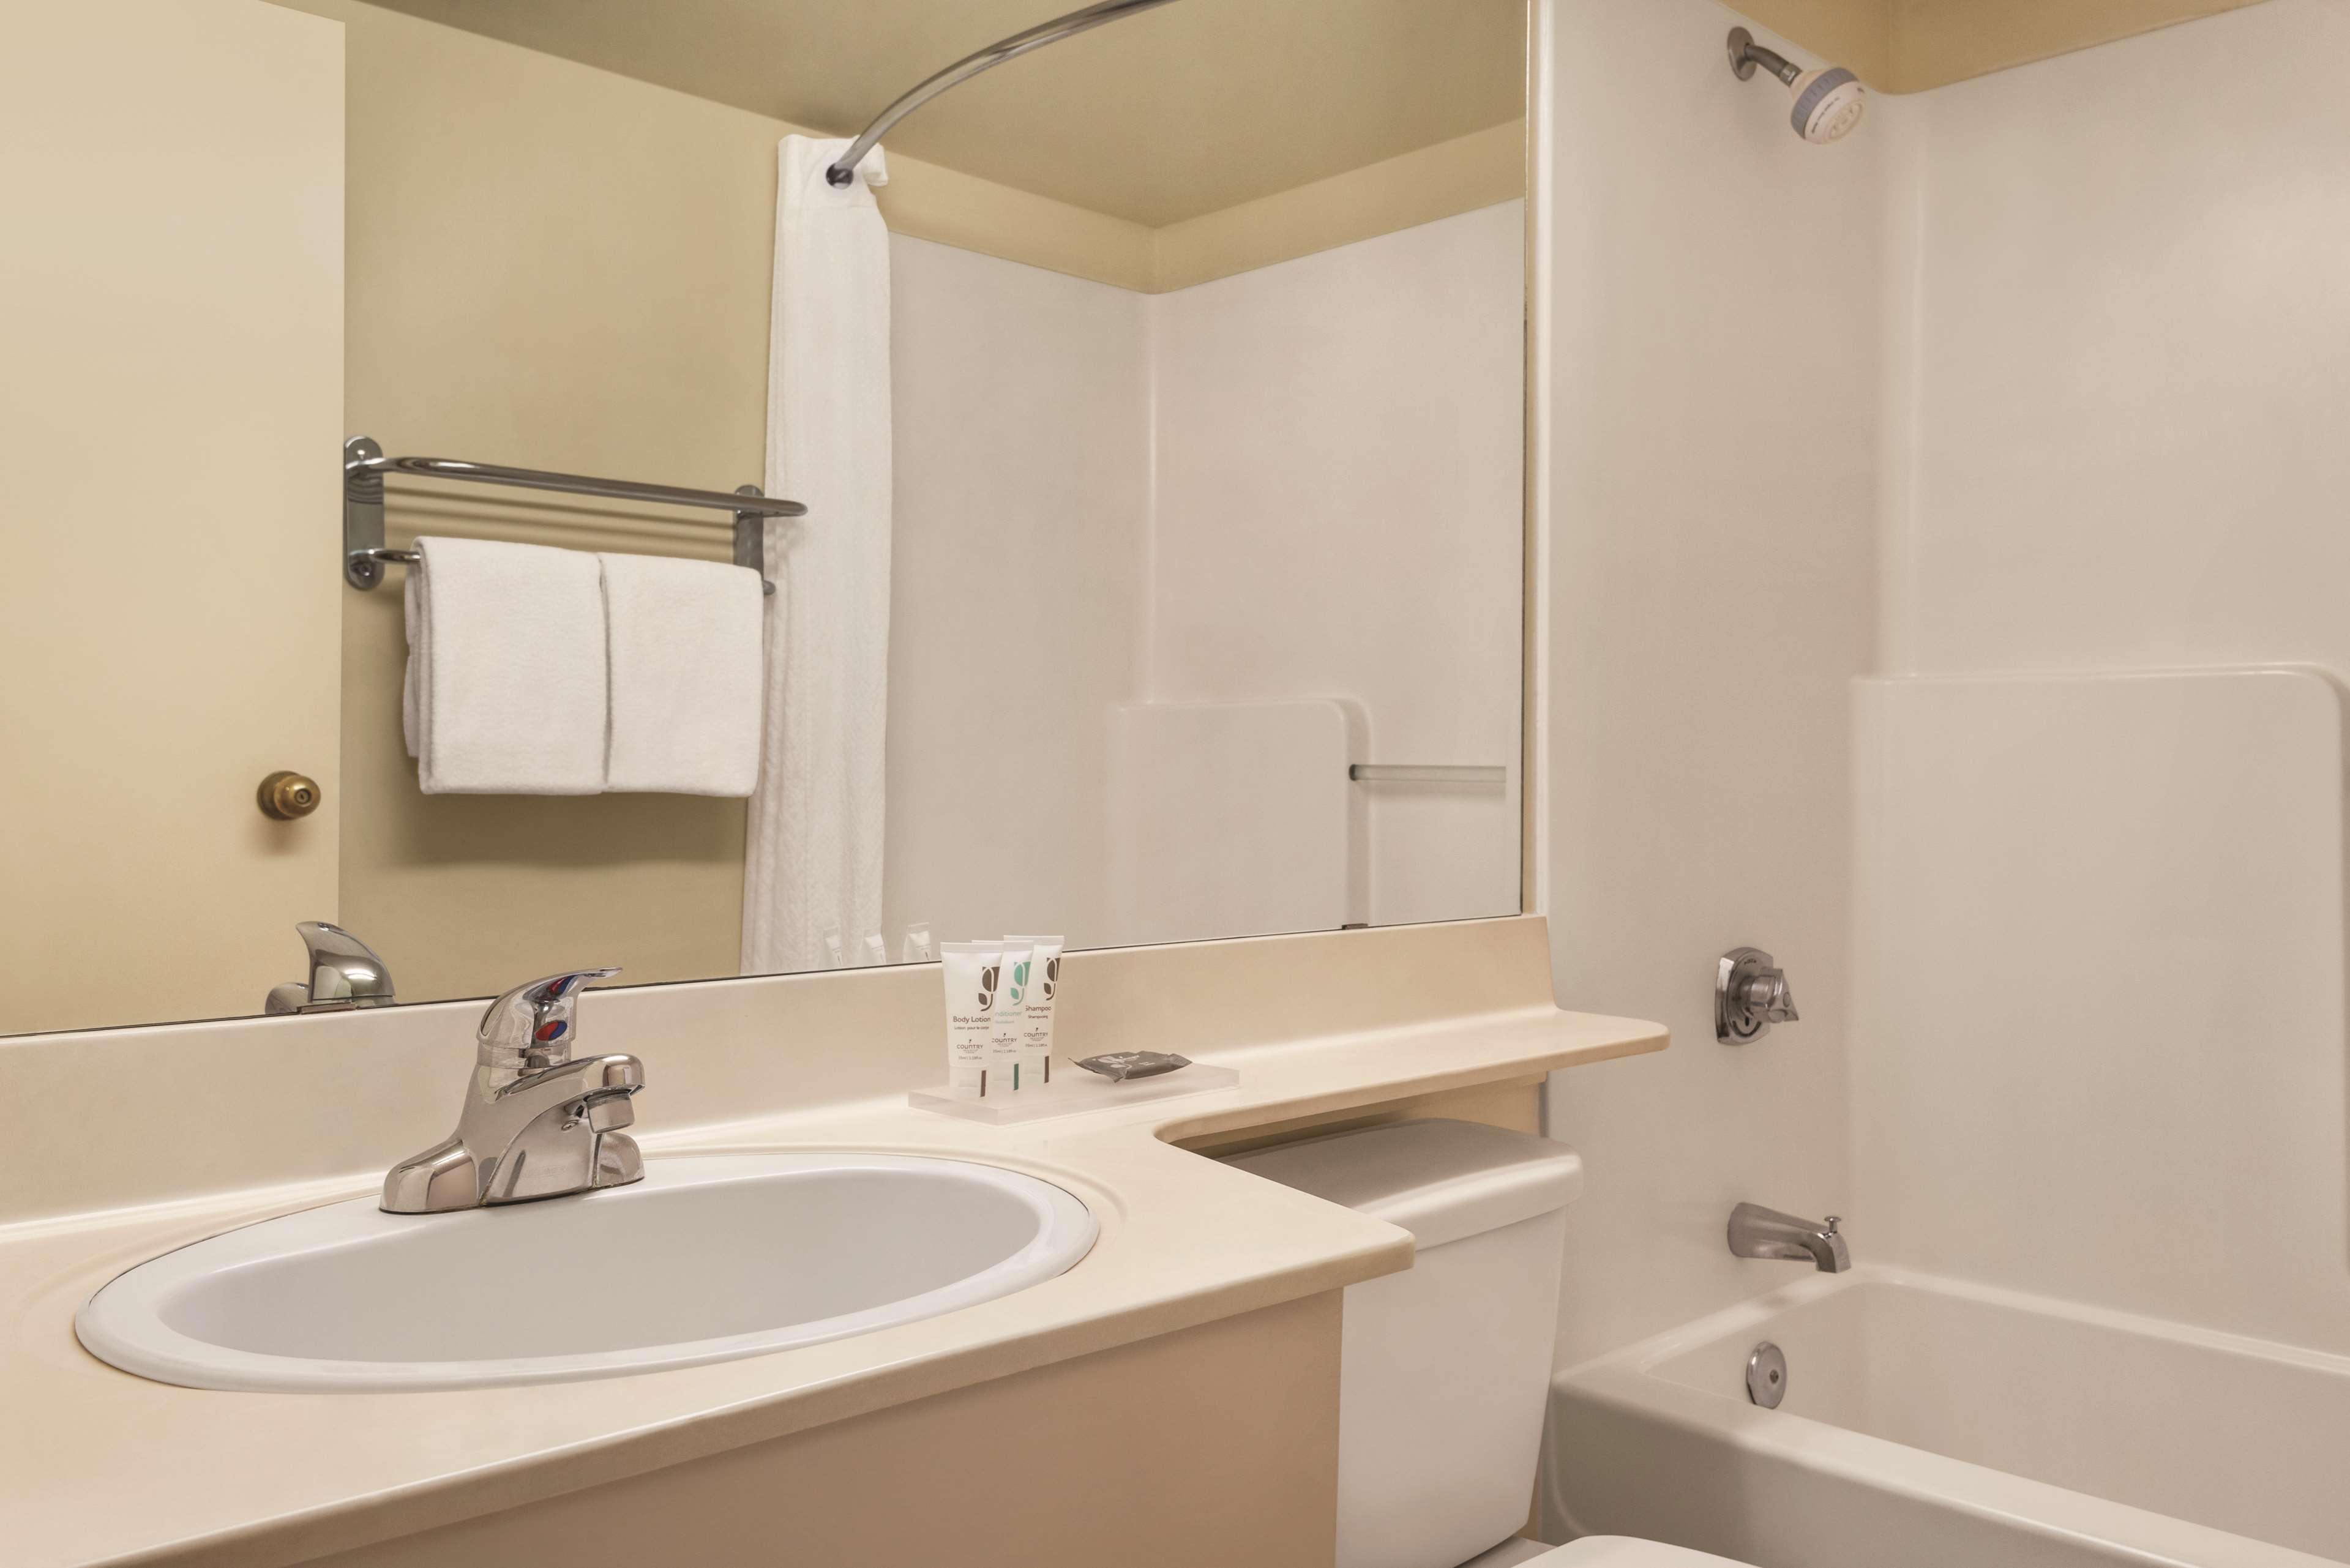 Country Inn & Suites by Radisson, Saskatoon, SK in Saskatoon: Guest Bathroom